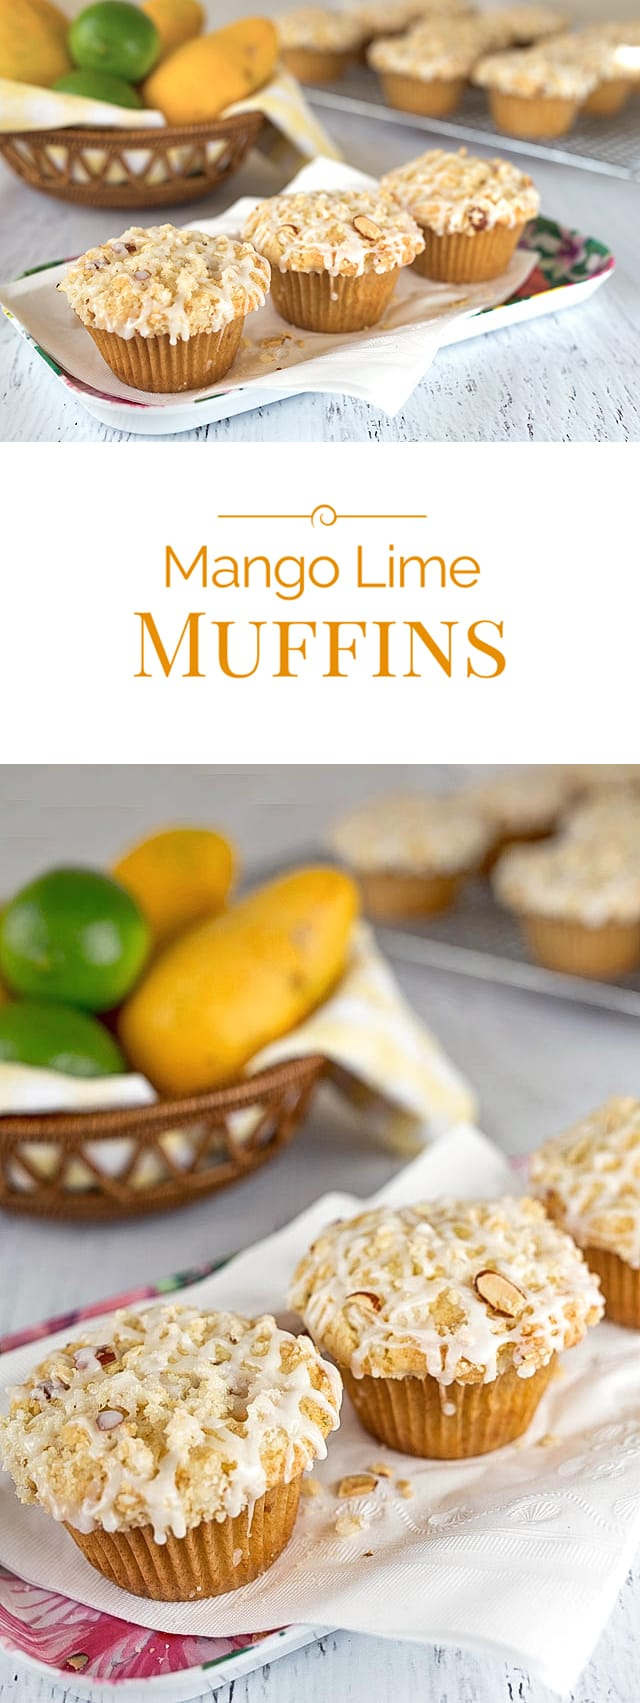 Mango-Lime-Muffins-Collage-2-Barbara-Bakes